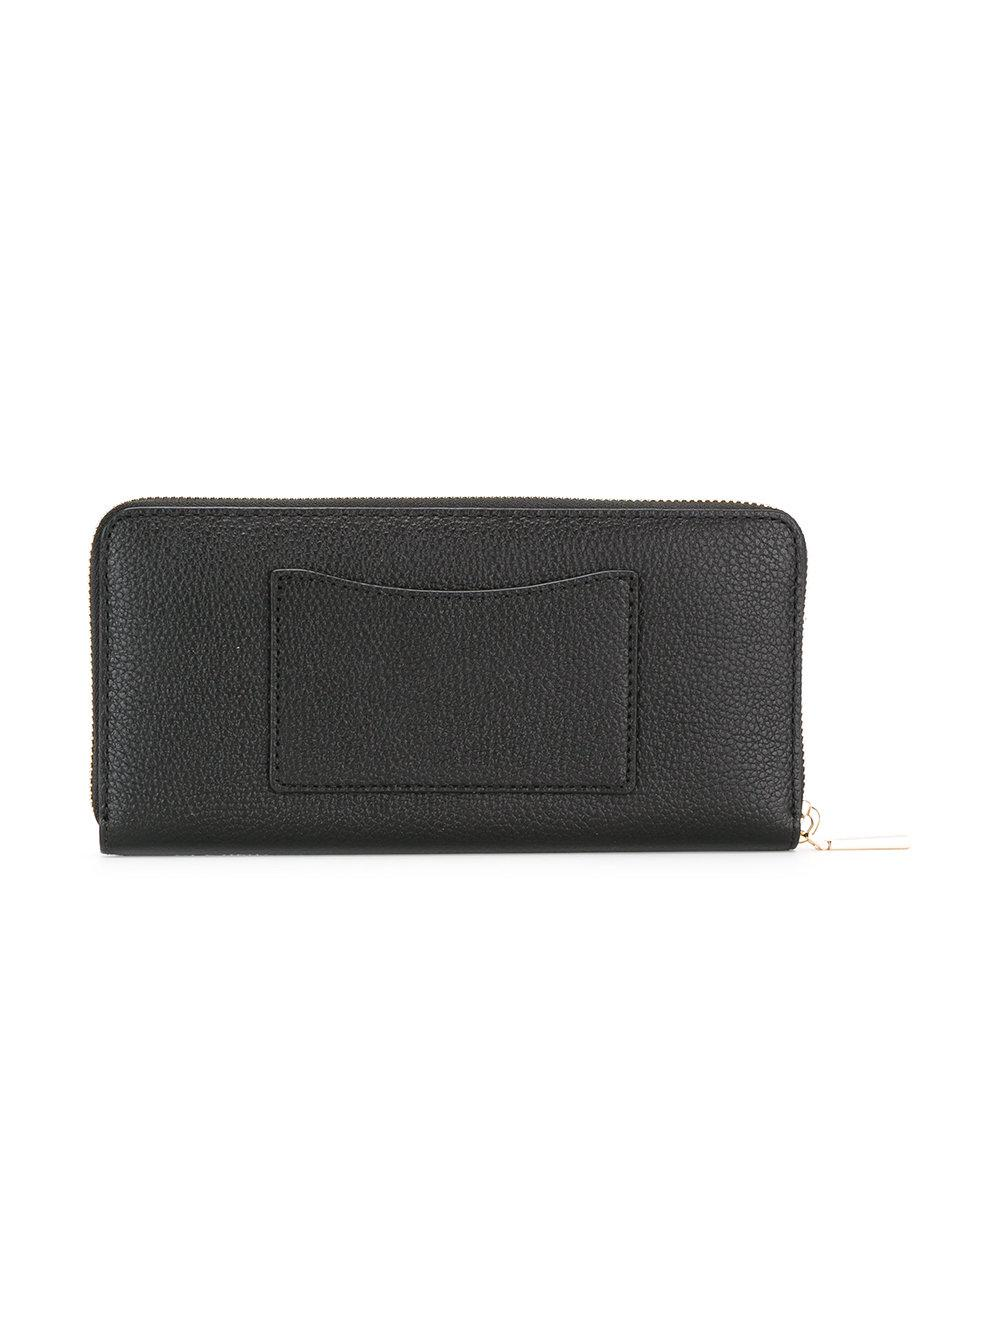 1d8e14e847897 Lyst - MICHAEL Michael Kors Mercer Leather Wallet in Black - Save 18%